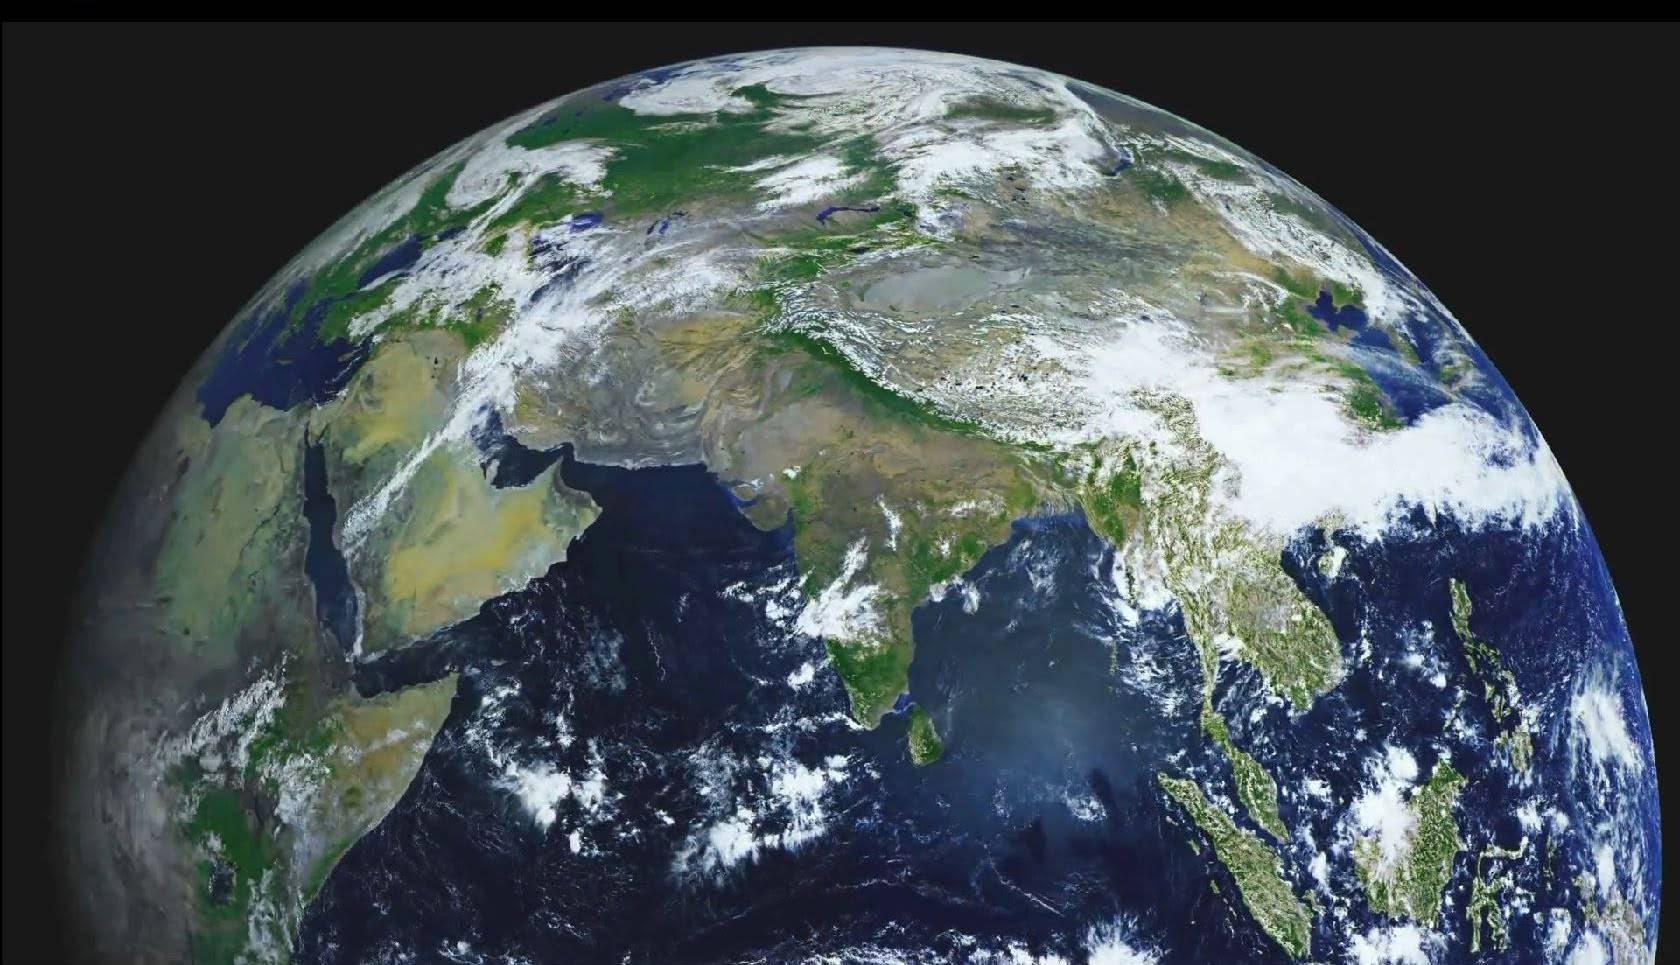 Zemljino magnetno polje – šta sa njim?